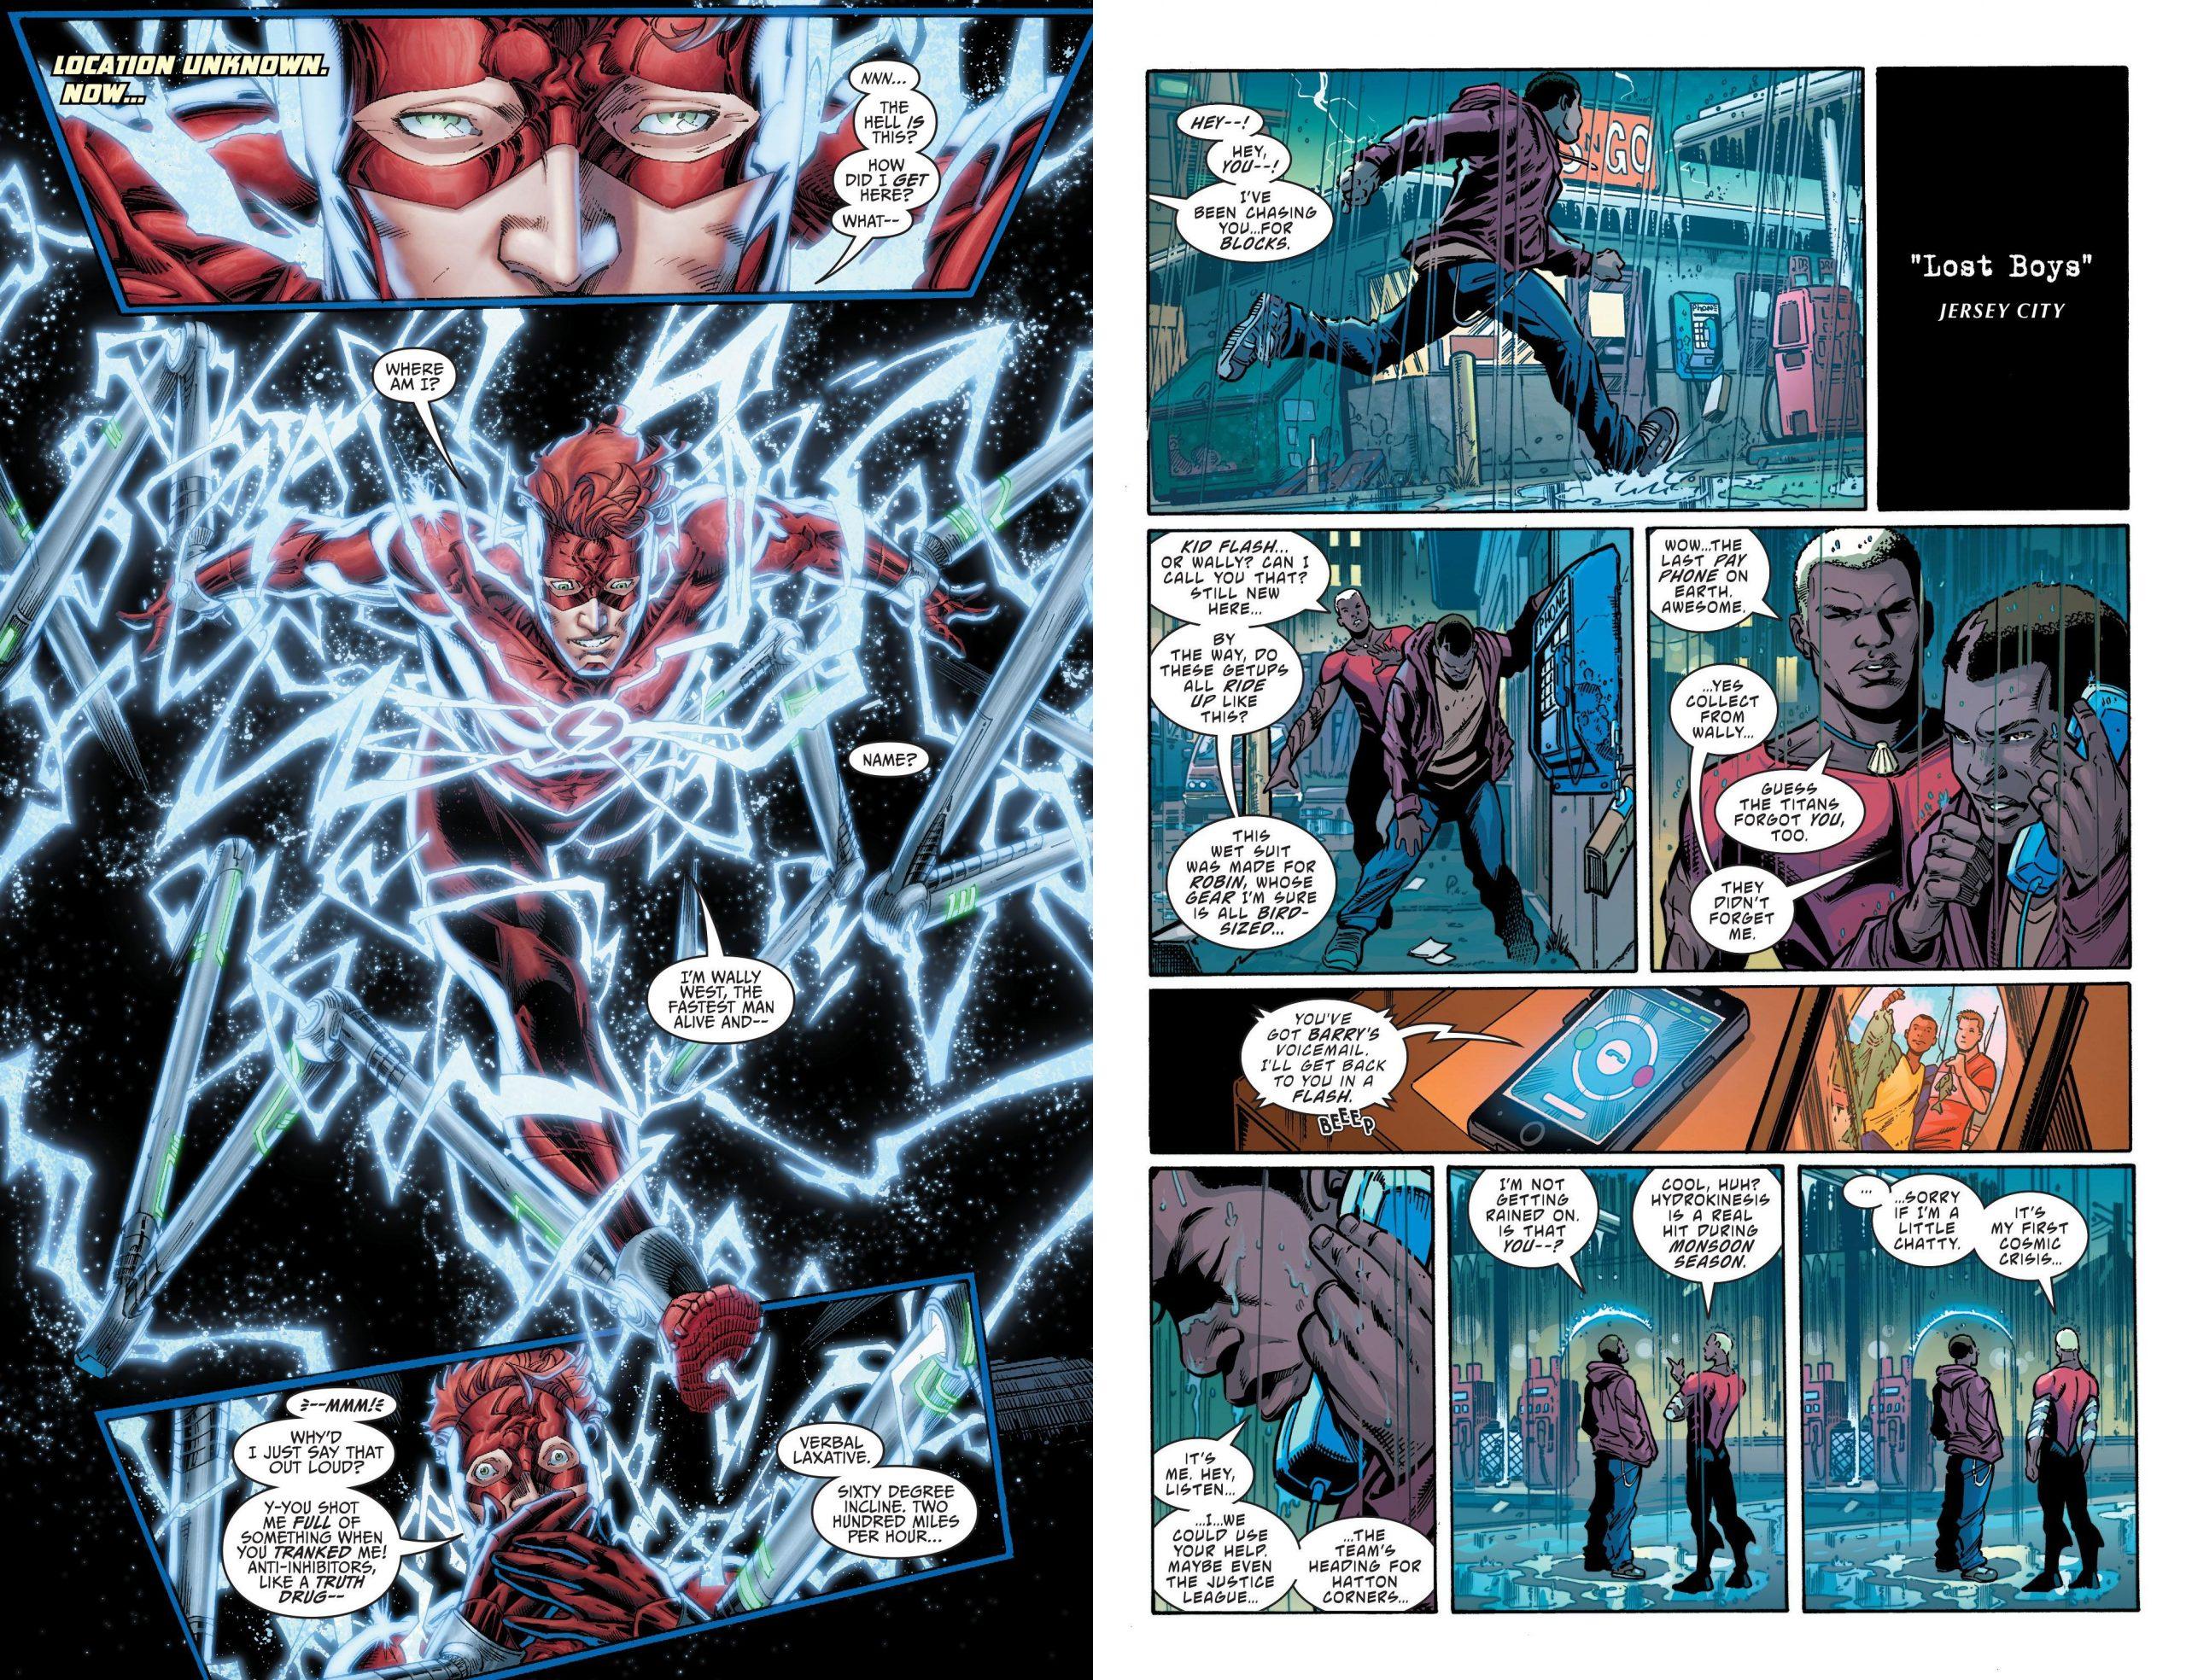 Titans - The Lazarus Contract review